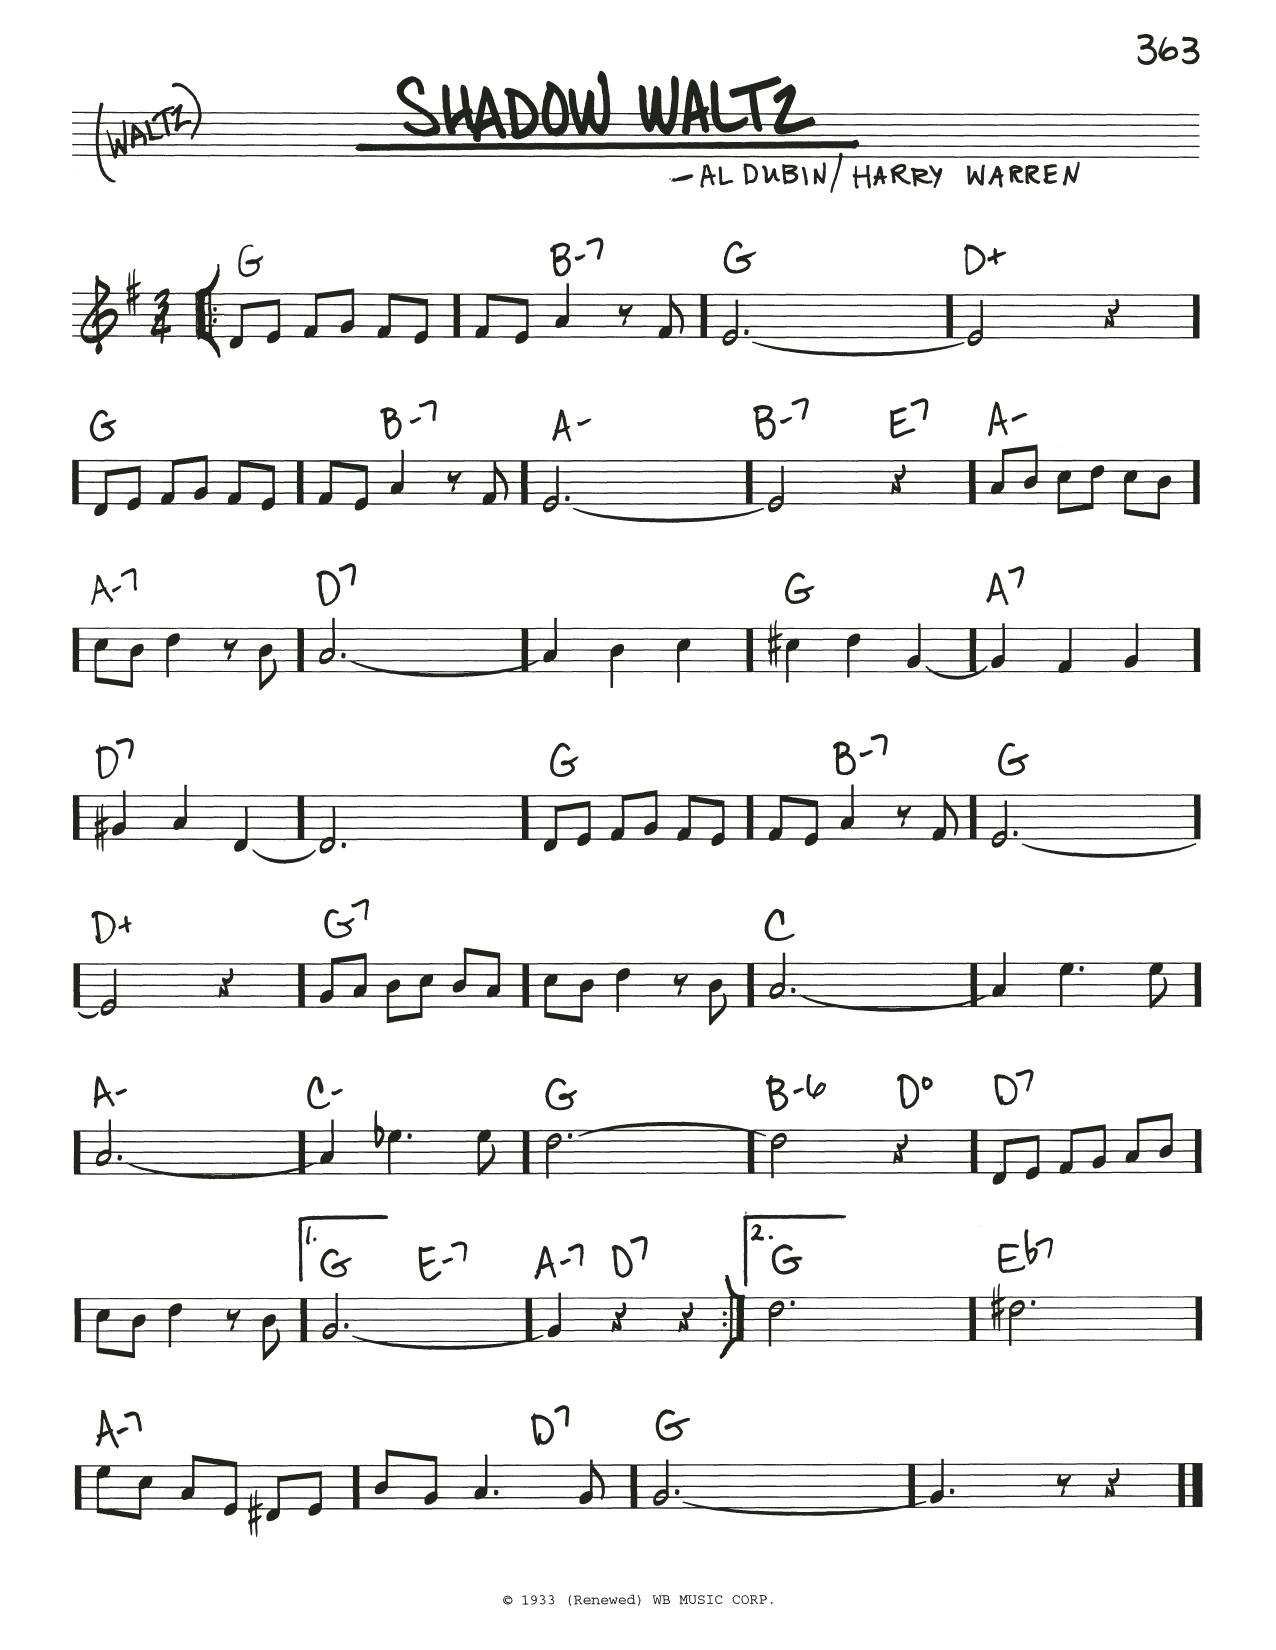 Shadow Waltz sheet music